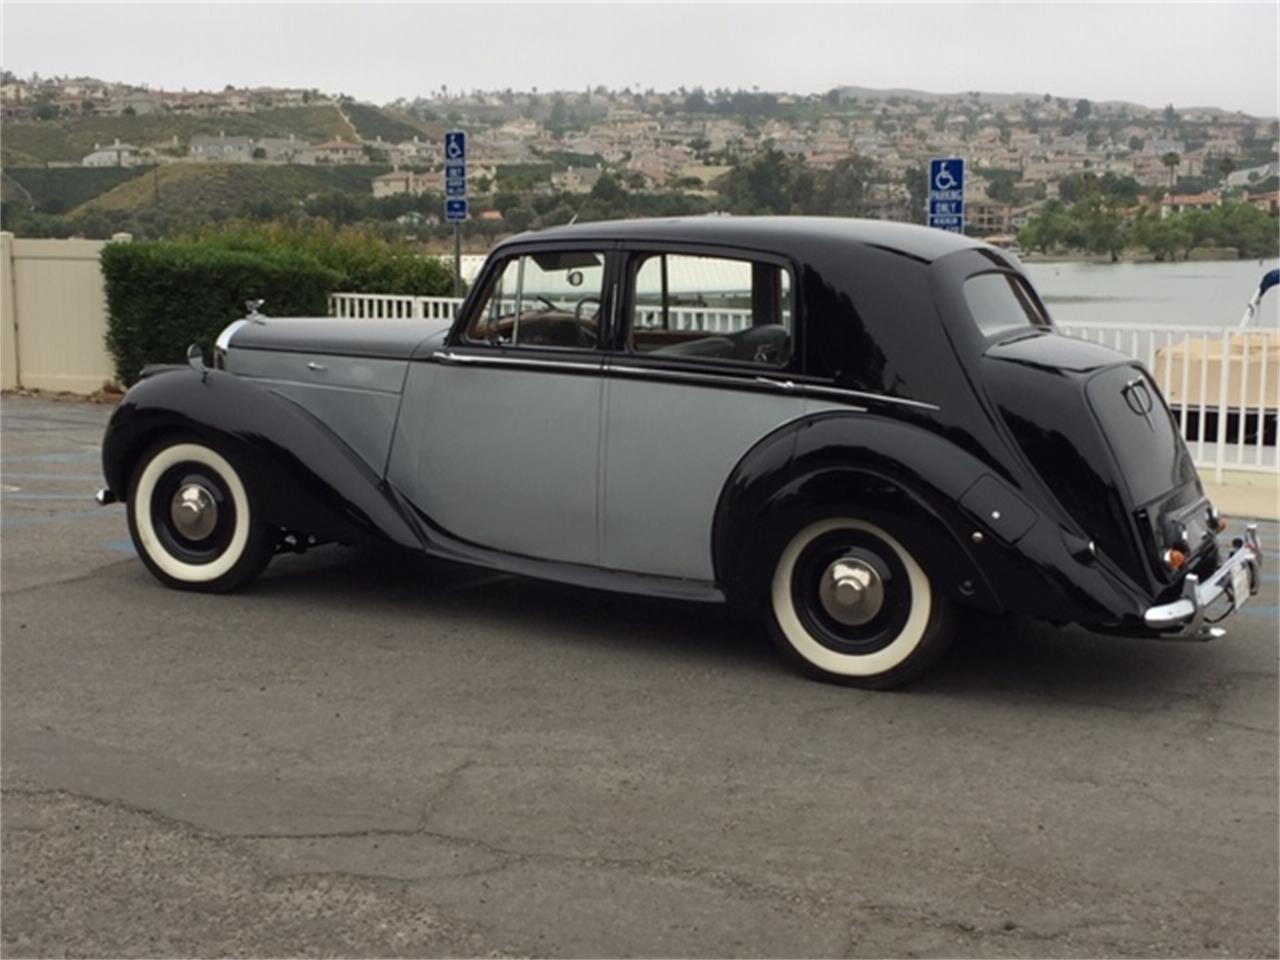 Large Picture of '50 Mark VI located in California - $45,000.00 - Q4FX